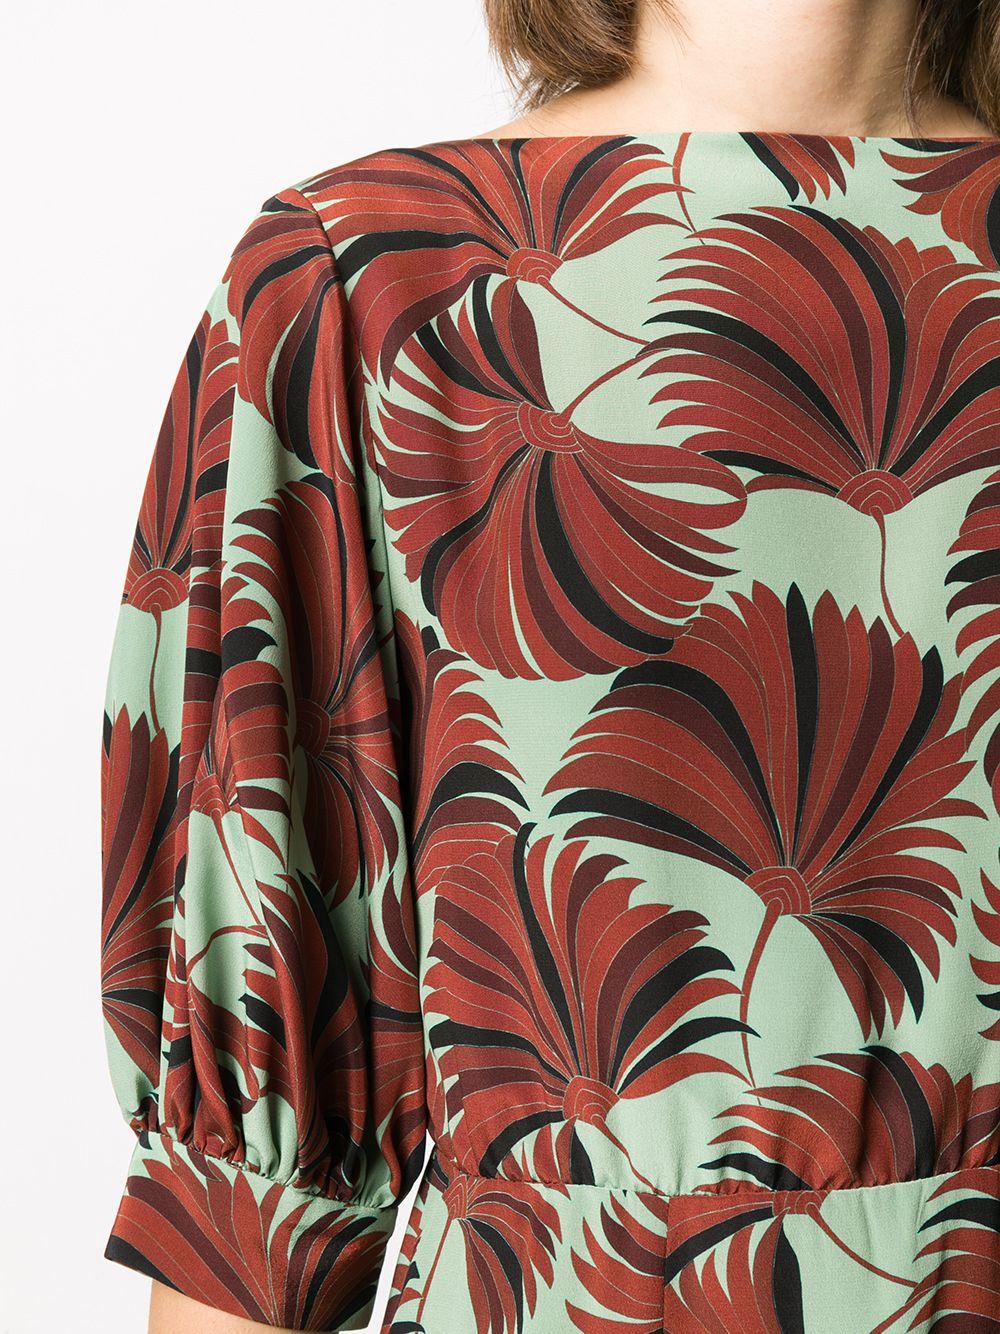 Abito midi svasato Duzen in seta verde menta e marrone con stampa floreale a fantasia DRIES VAN NOTEN | Abiti | DUZEN BIS-1200608